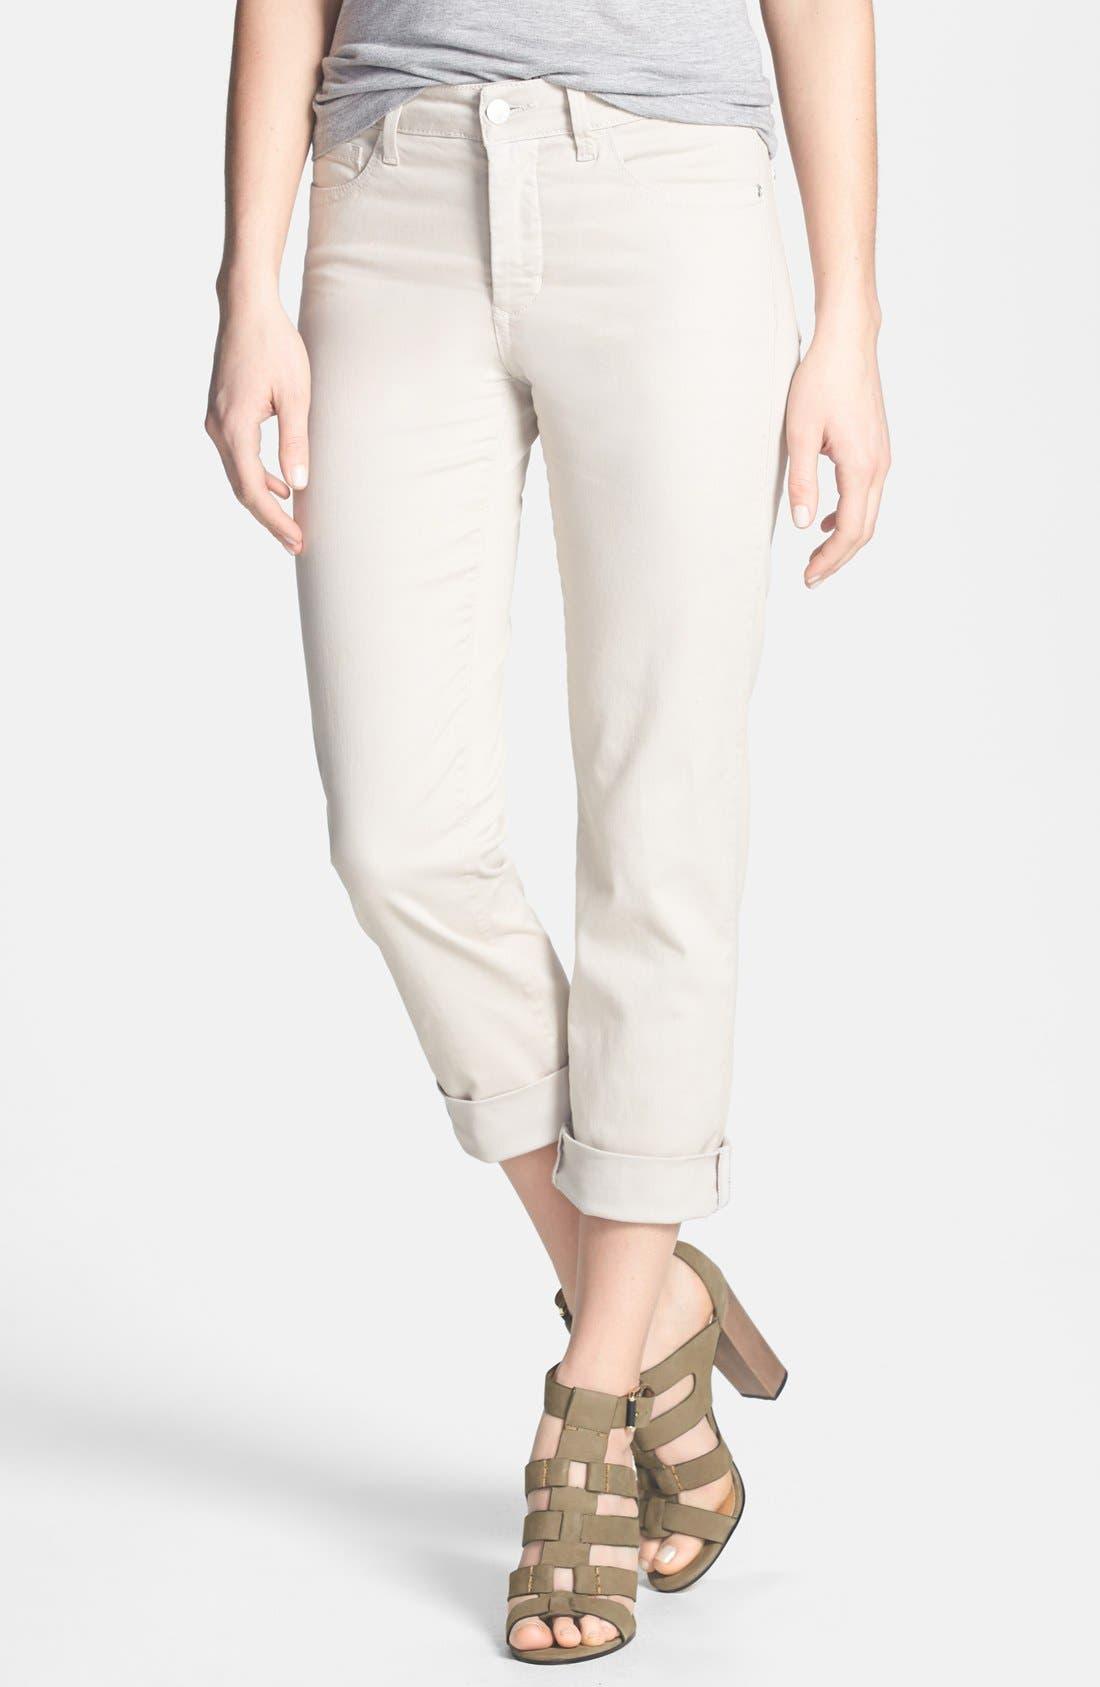 Alternate Image 1 Selected - NYDJ 'Bobbie' Stretch Boyfriend Jeans (Regular & Petite)